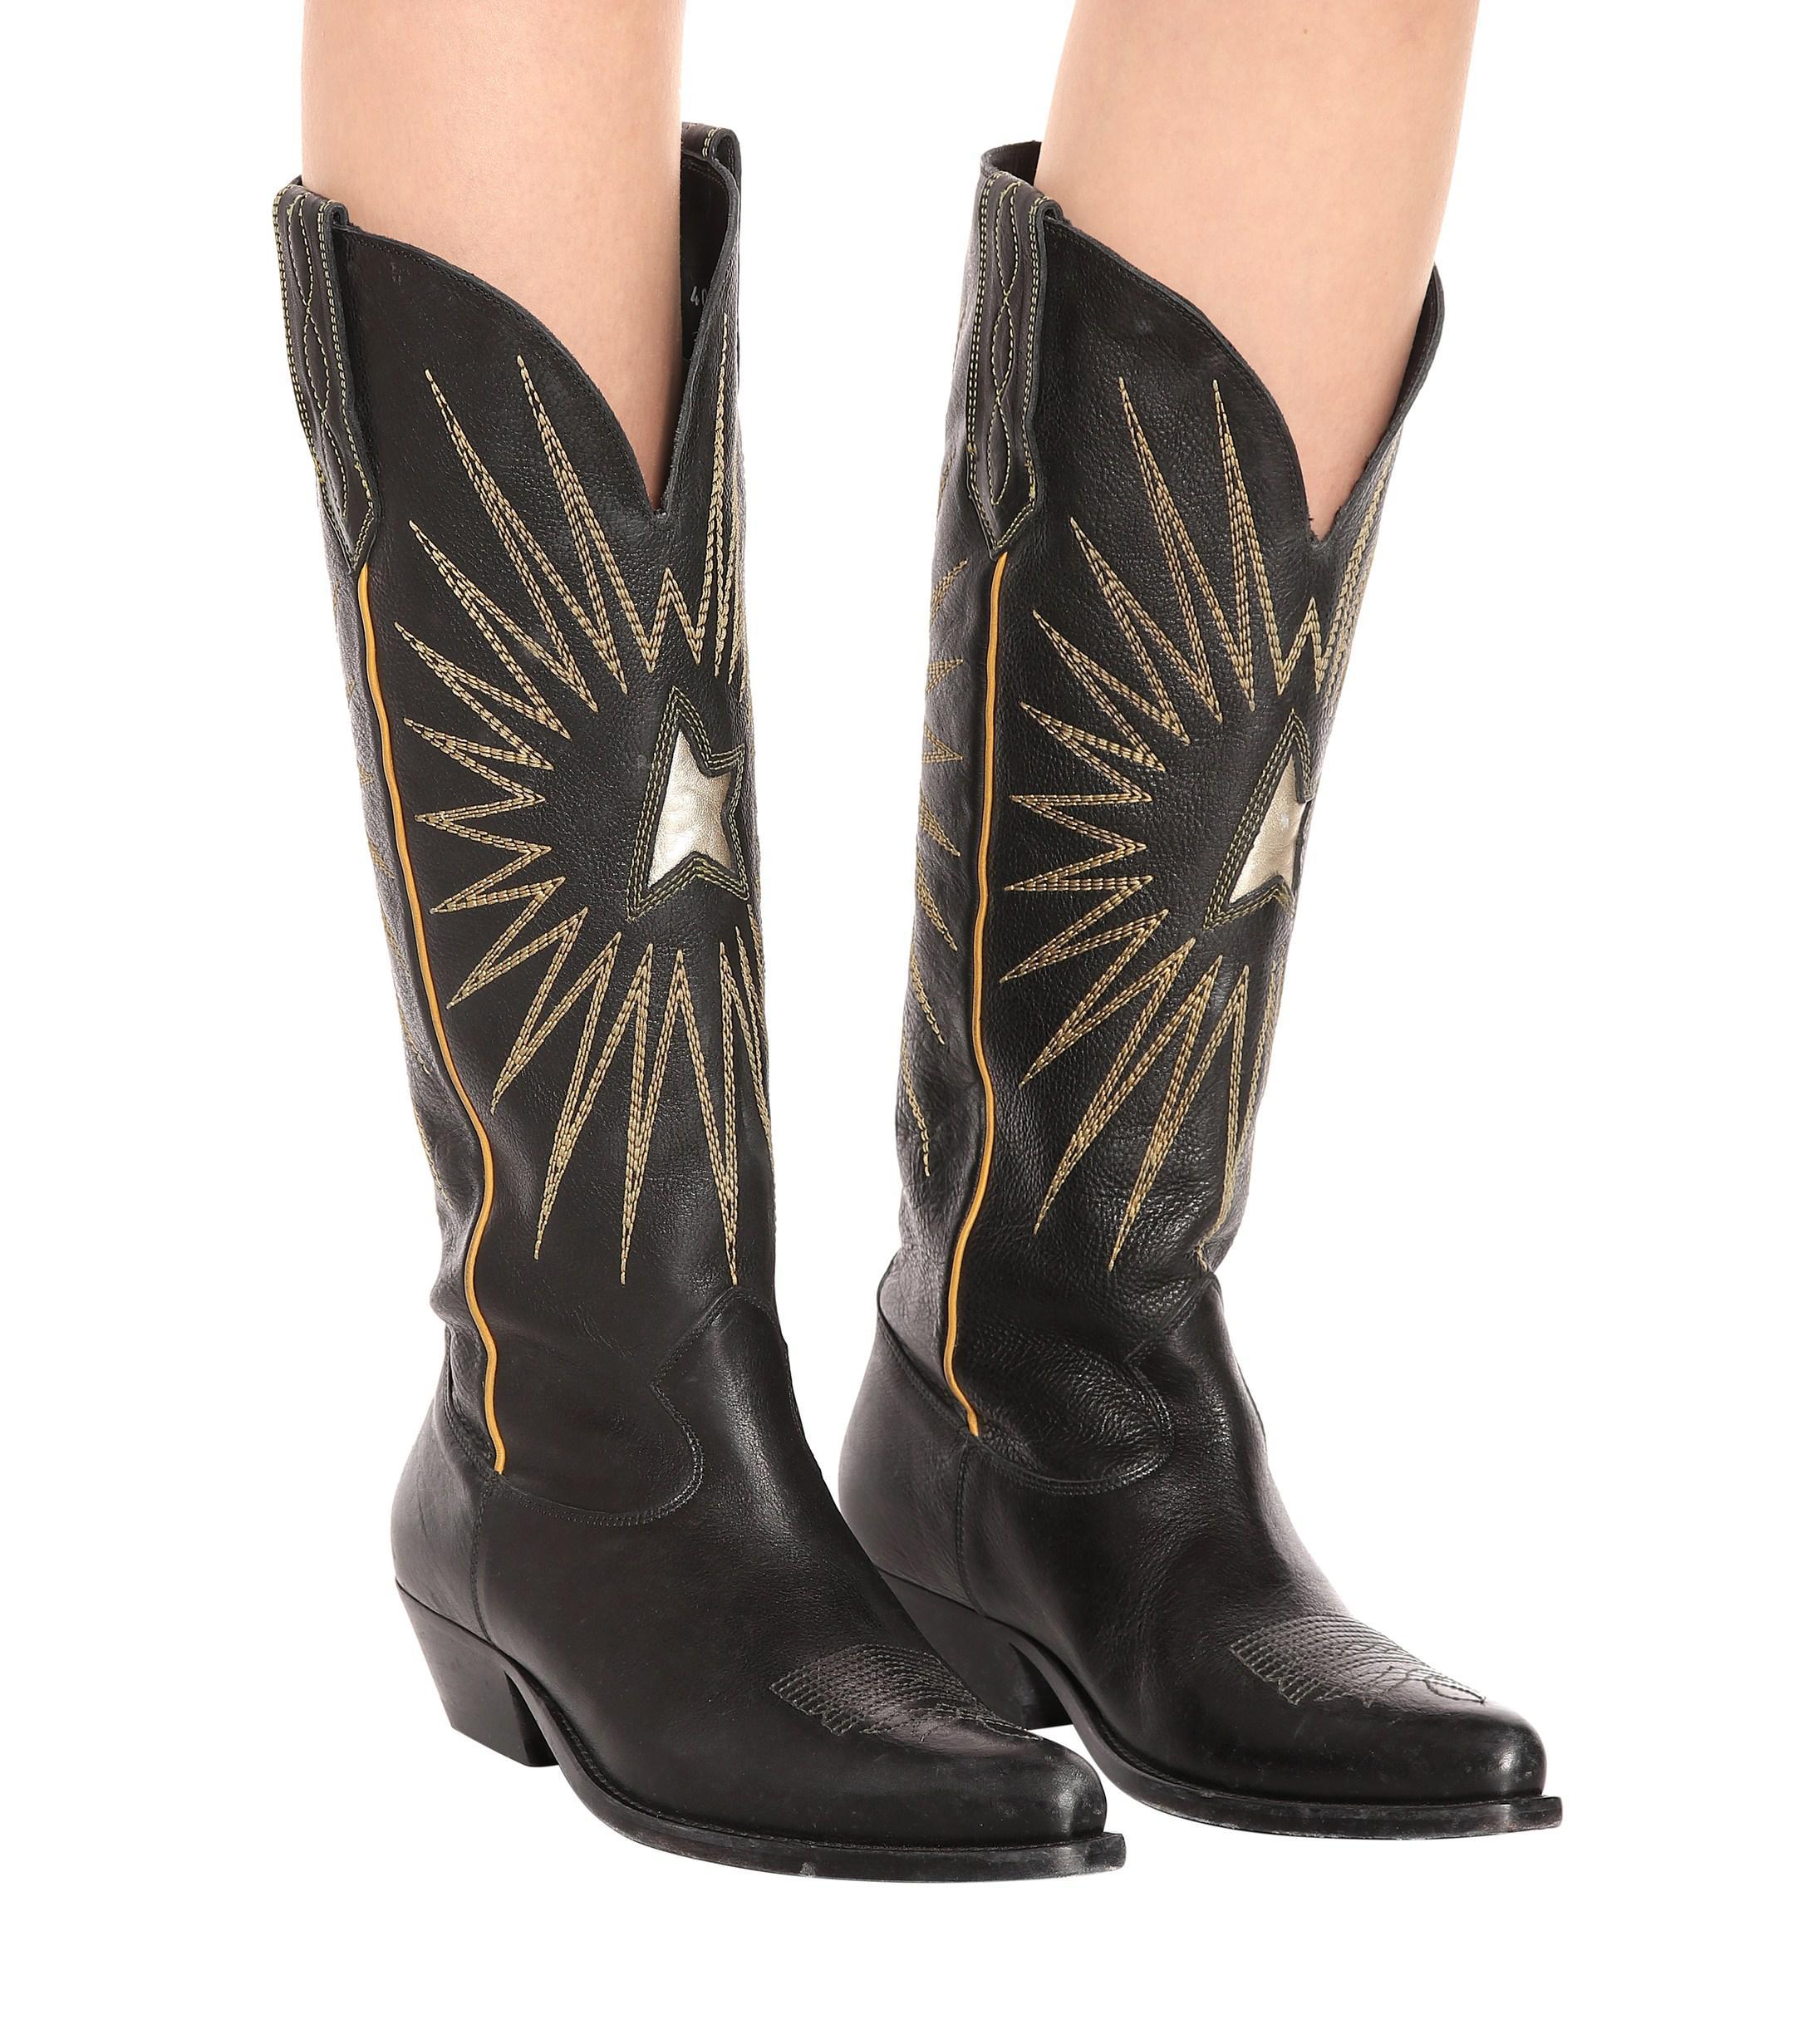 57aaf210318 Women's Black Wish Star Leather Cowboy Boots